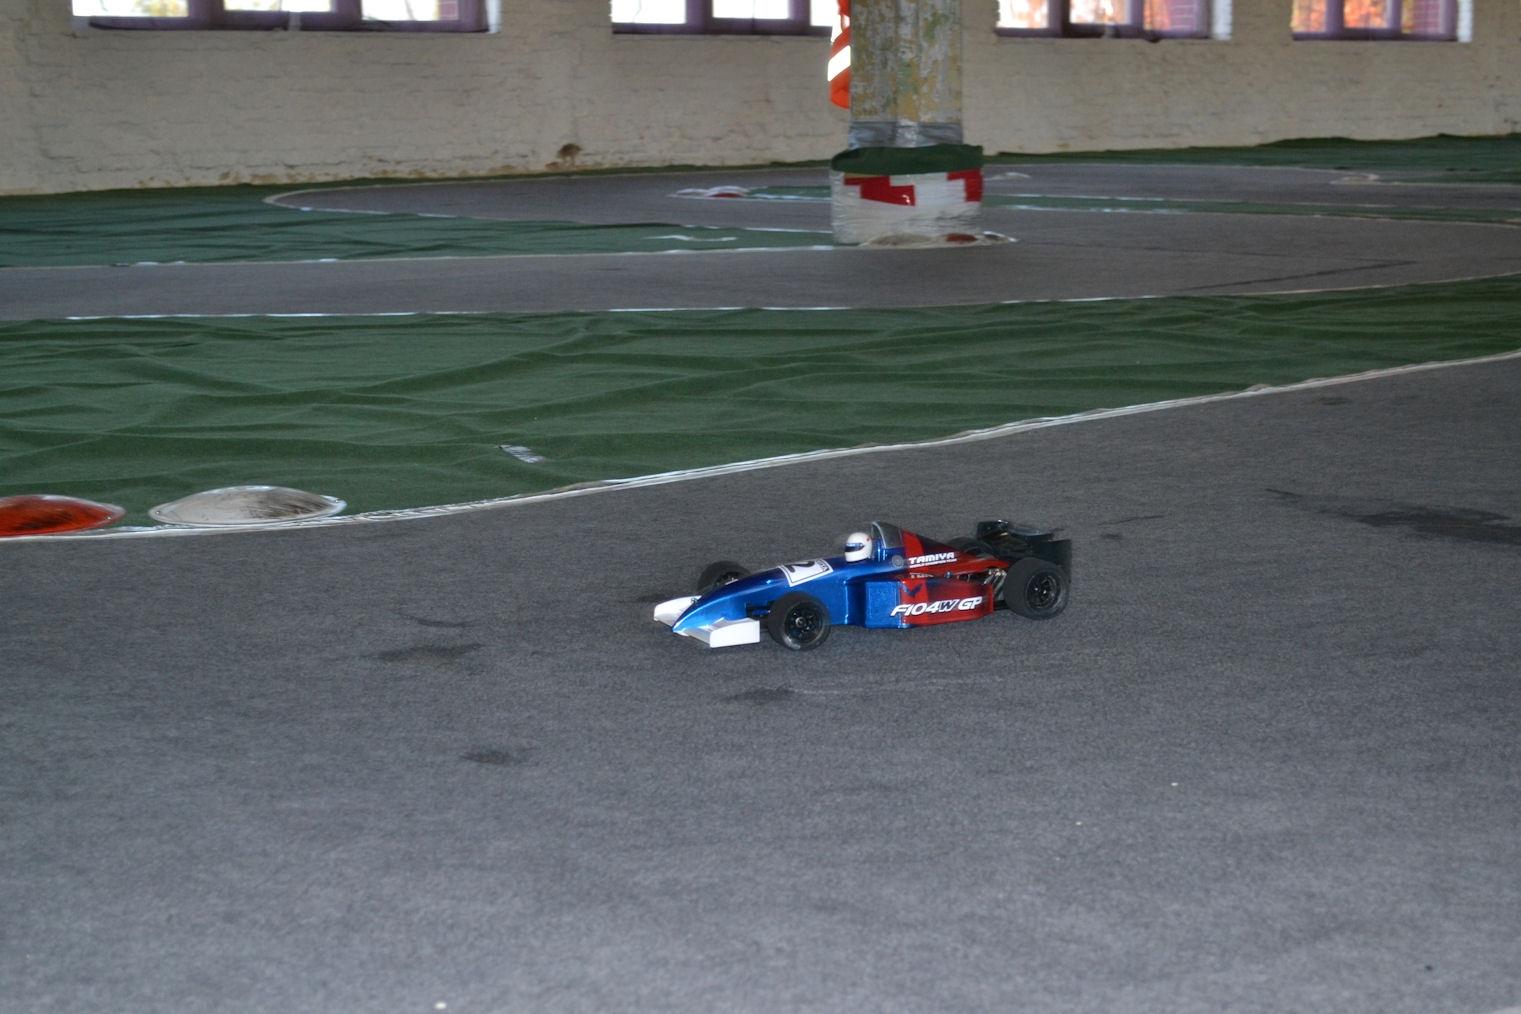 tec-burgstadt-21-10-12-f104-formel-12